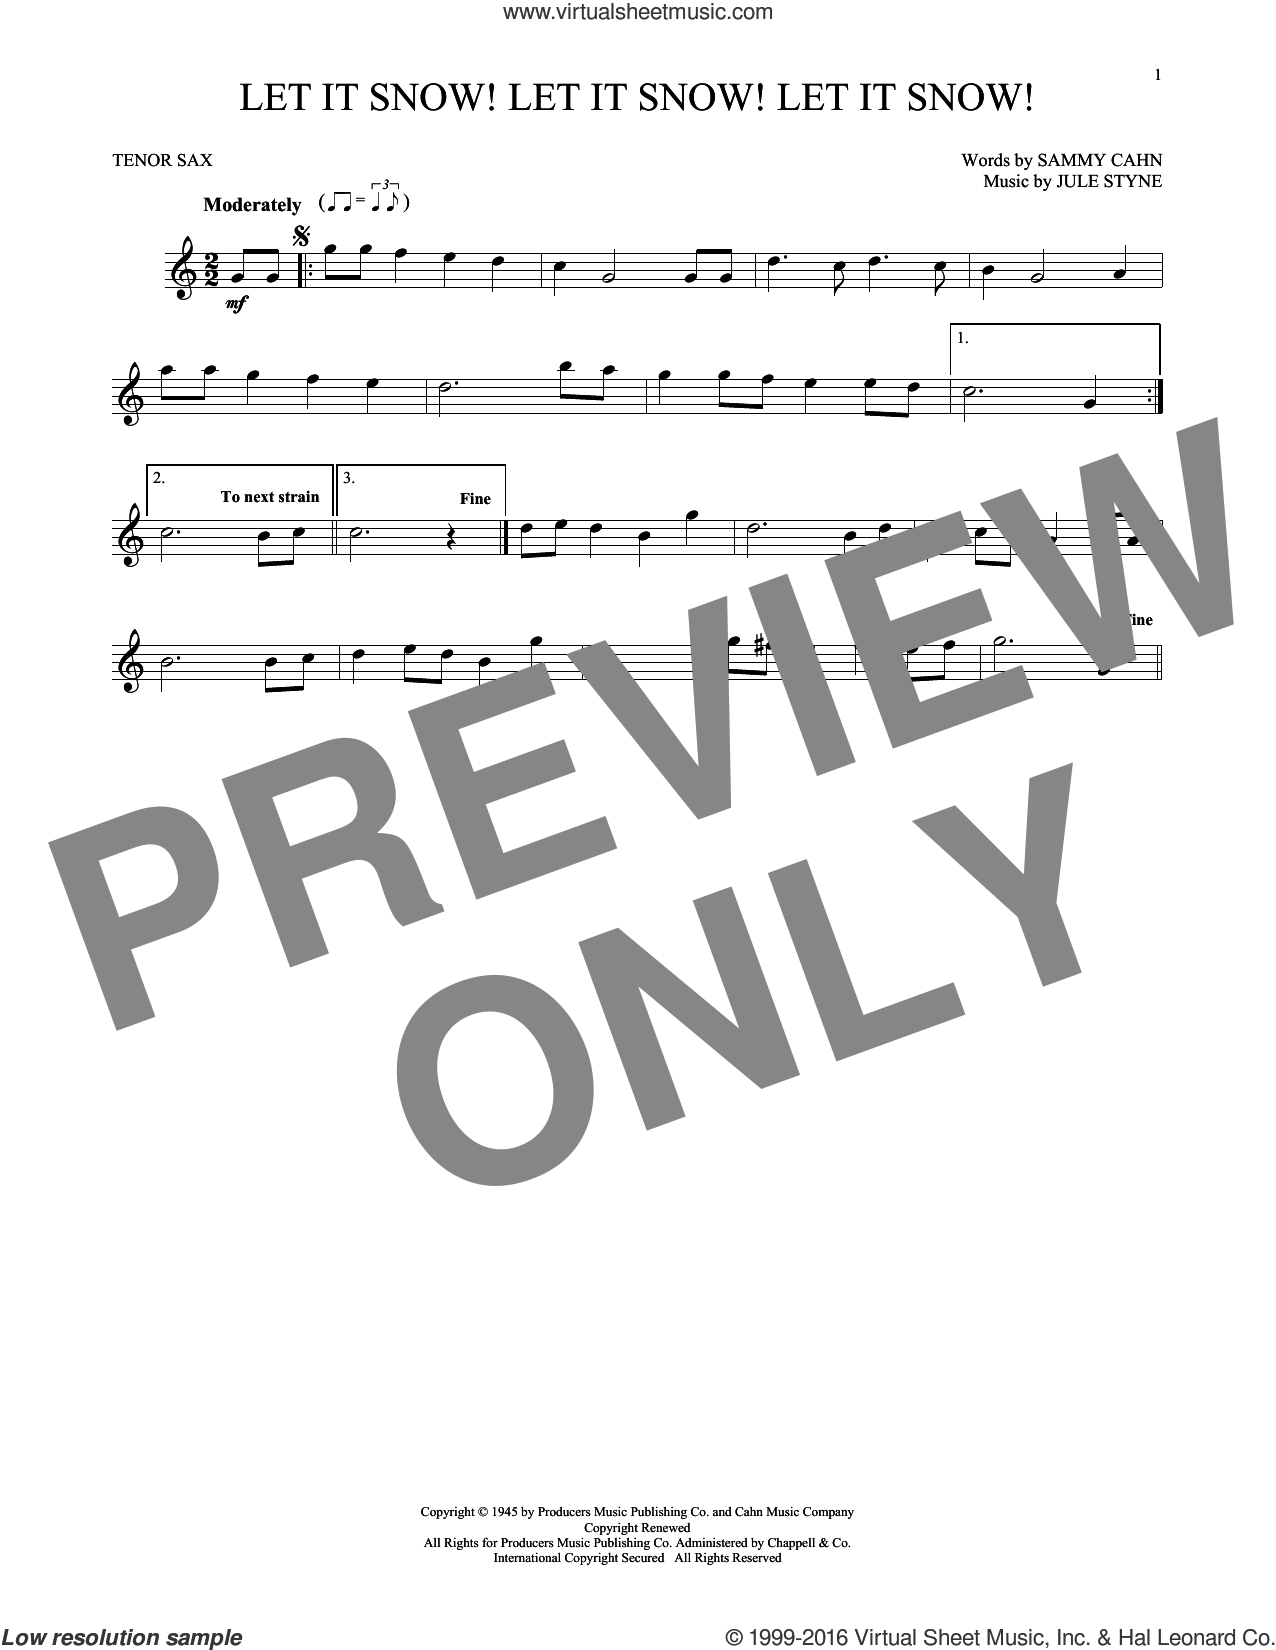 Let It Snow! Let It Snow! Let It Snow! sheet music for tenor saxophone solo by Sammy Cahn, Jule Styne and Sammy Cahn & Julie Styne, intermediate skill level